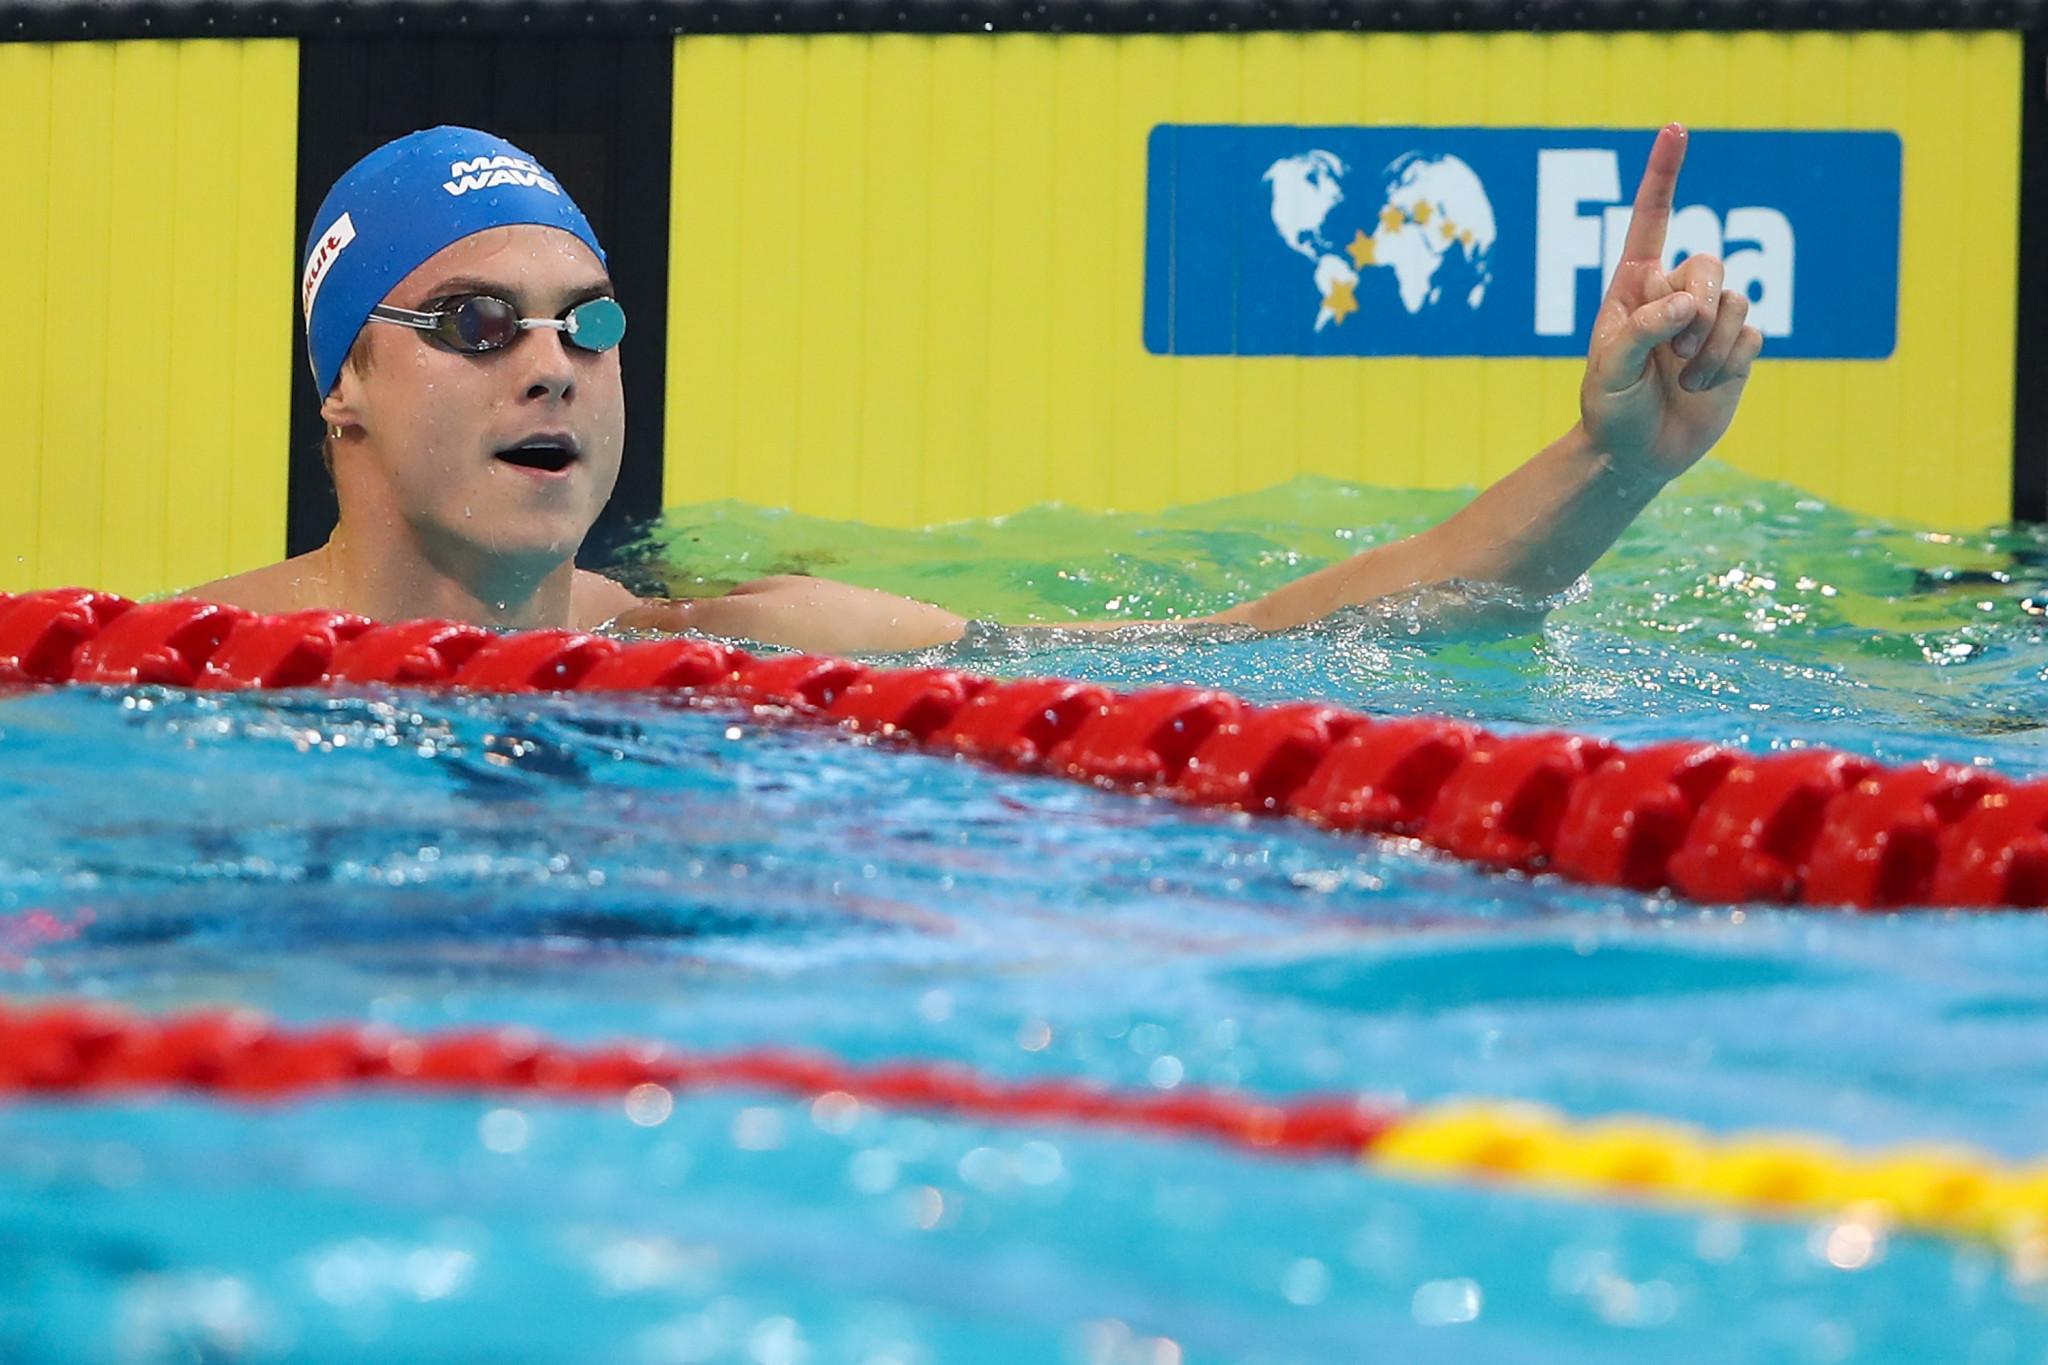 Morozov keeps up good form at Swimming World Cup in Jinan